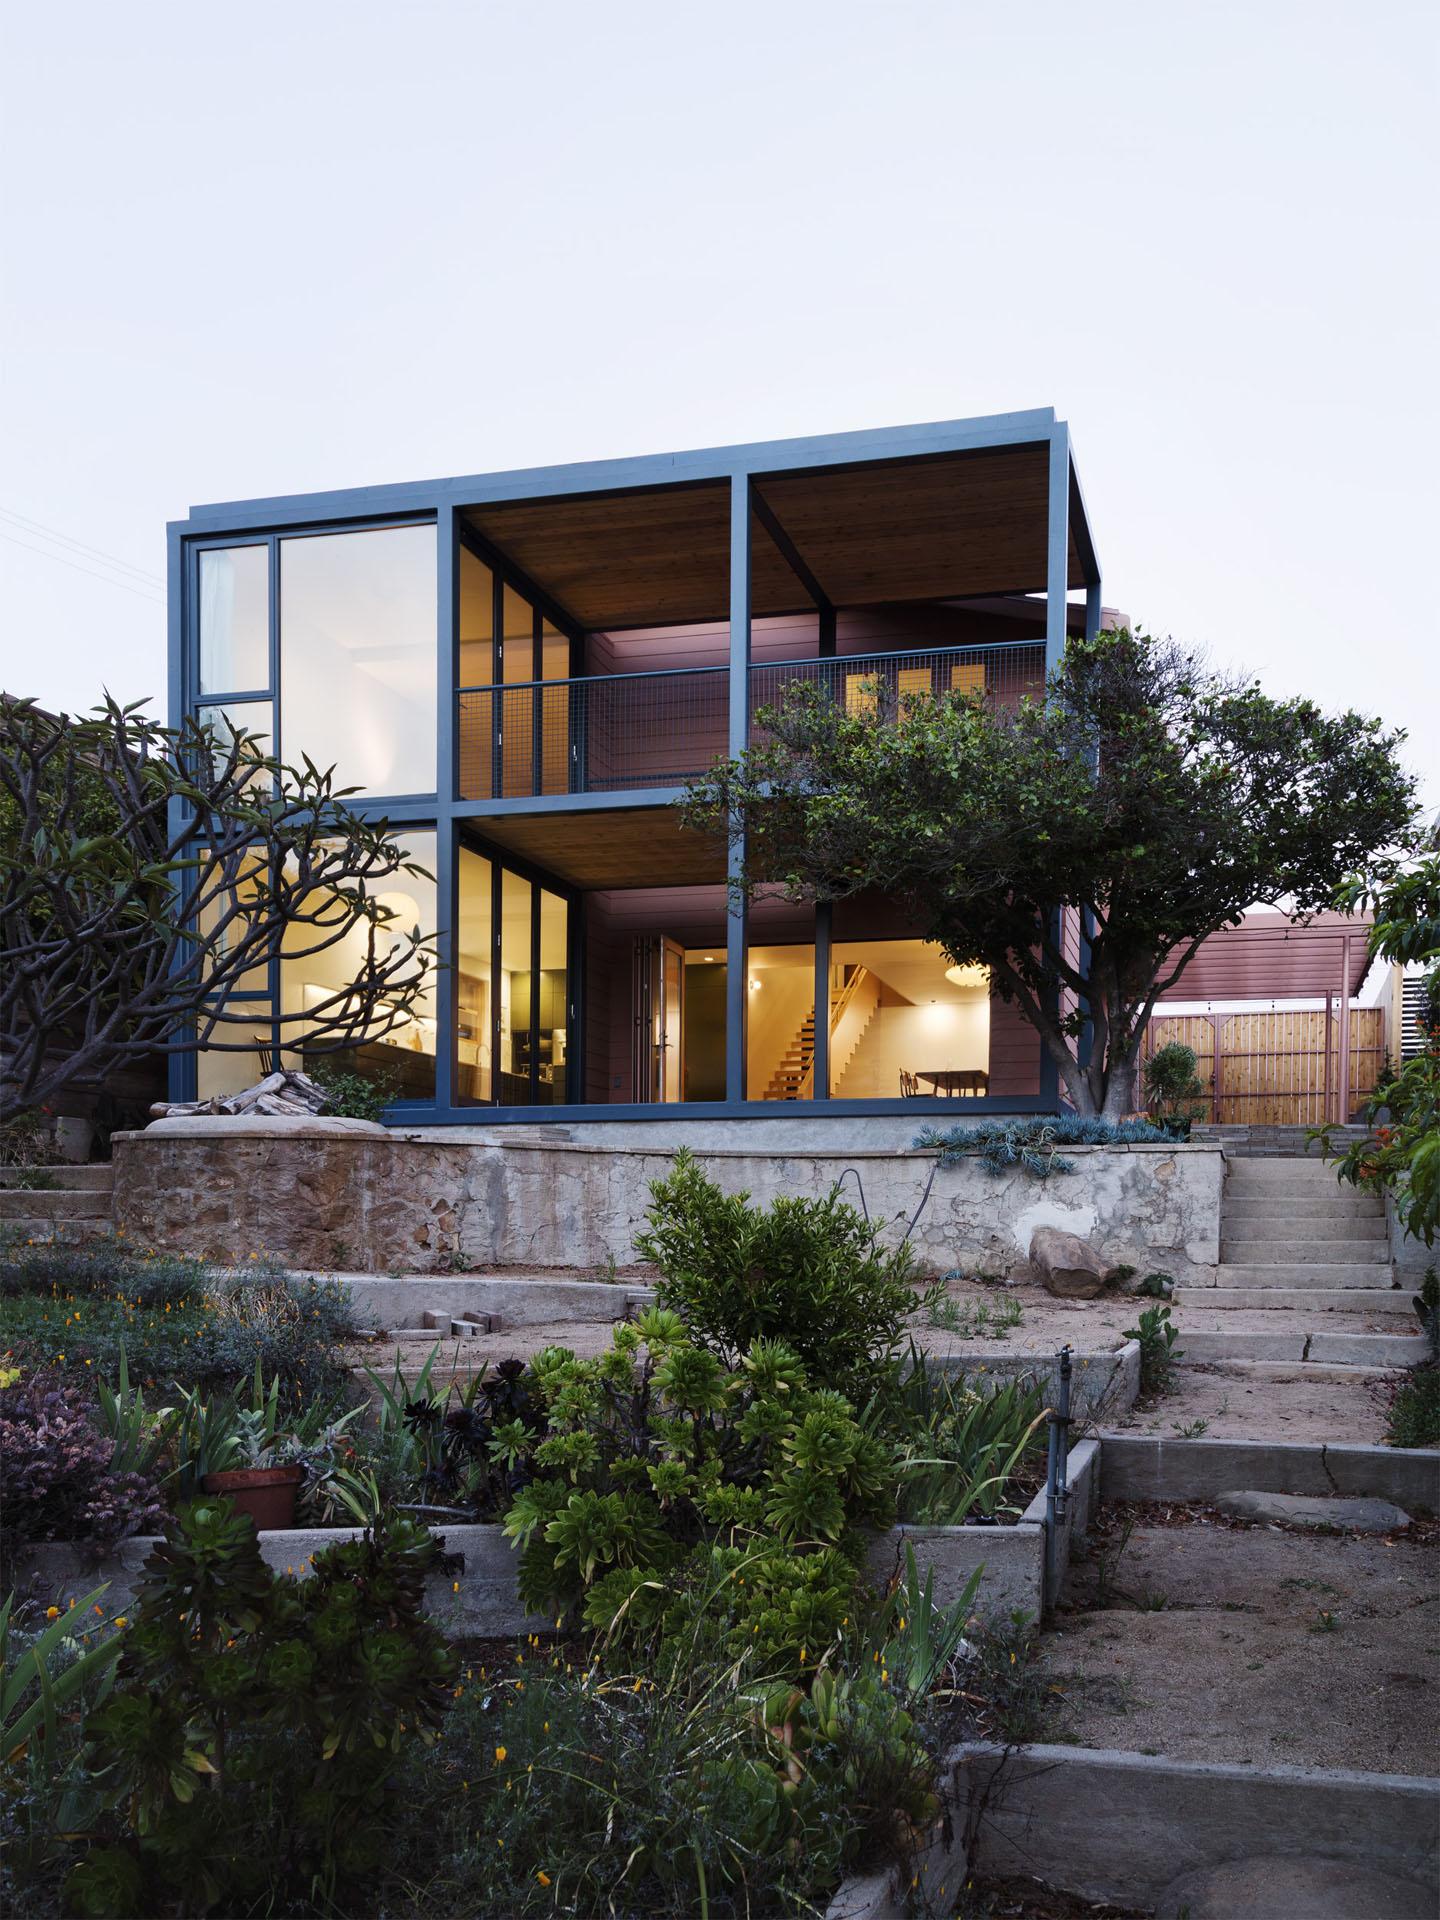 1920s bungalow gets gorgeous modern renovation